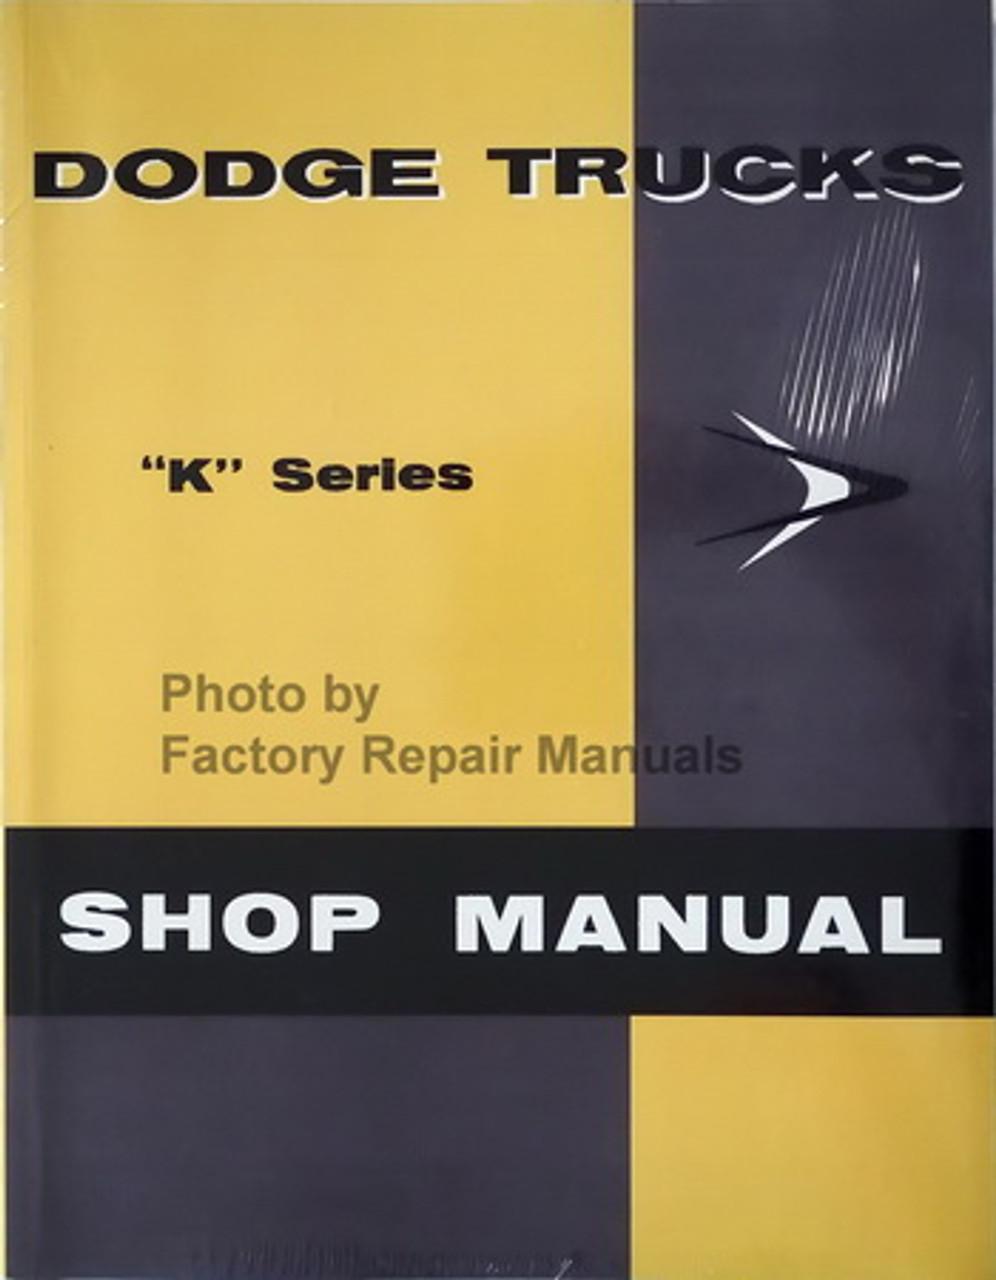 1957 dodge truck wiring diagram 1957 dodge truck van power wagon factory shop manual service  1957 dodge truck van power wagon